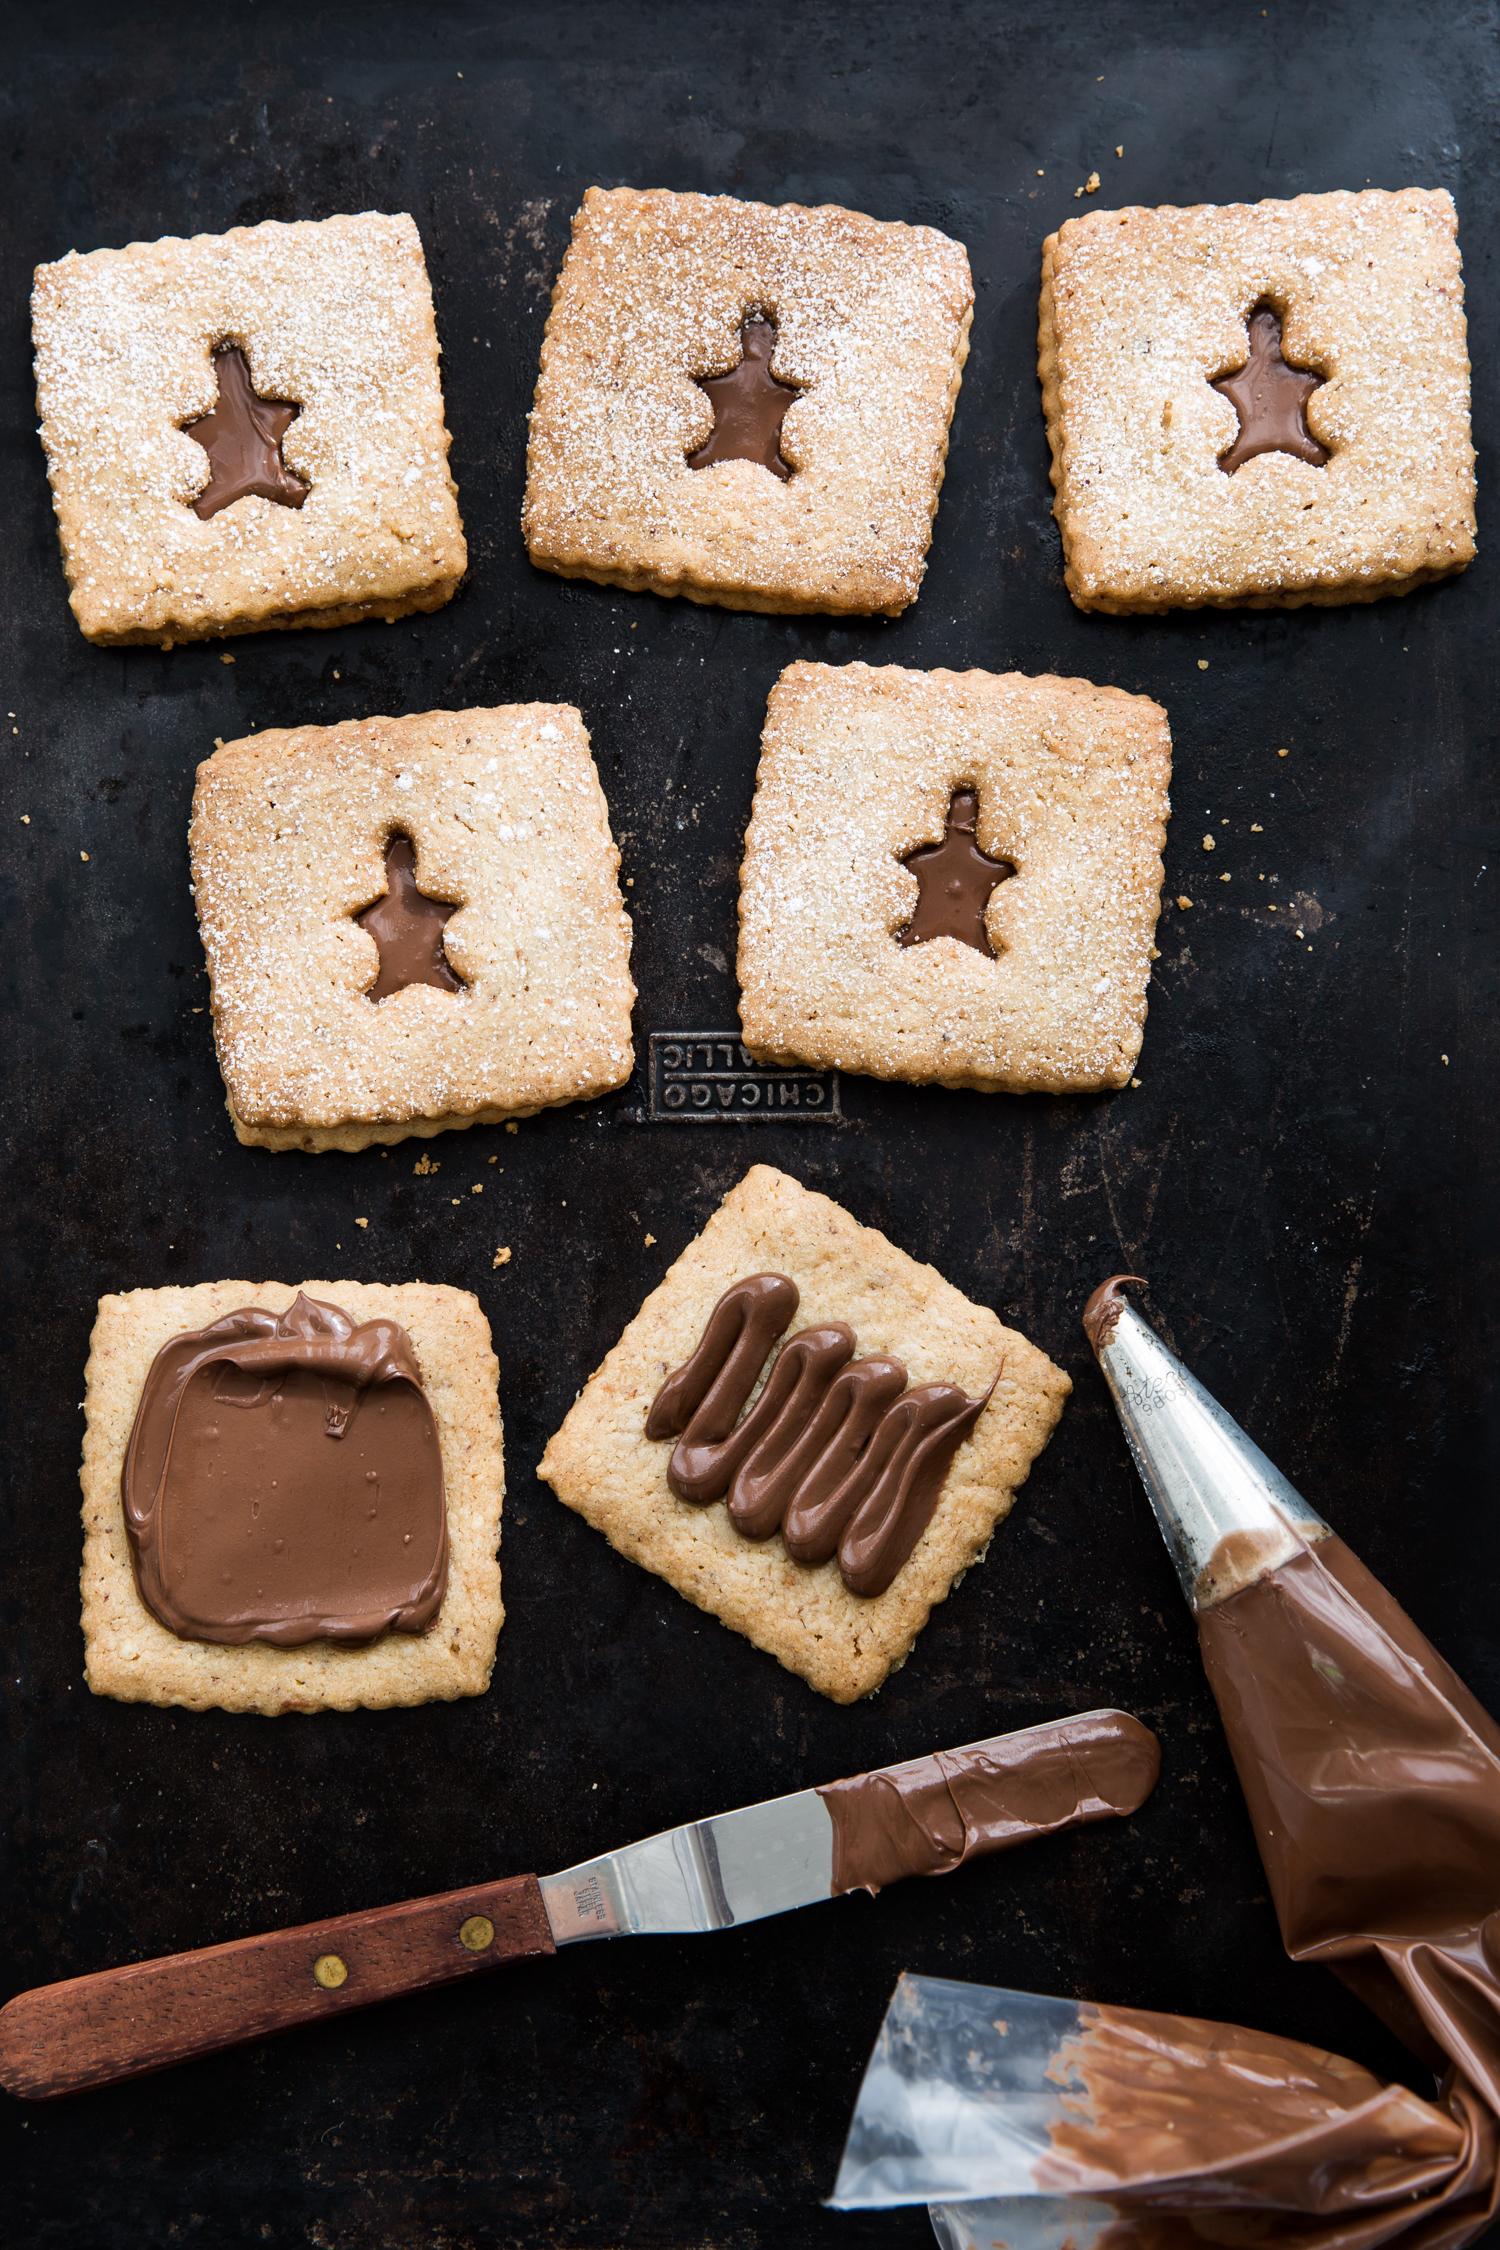 erinscottphotography_holidaycookies-5.jpg